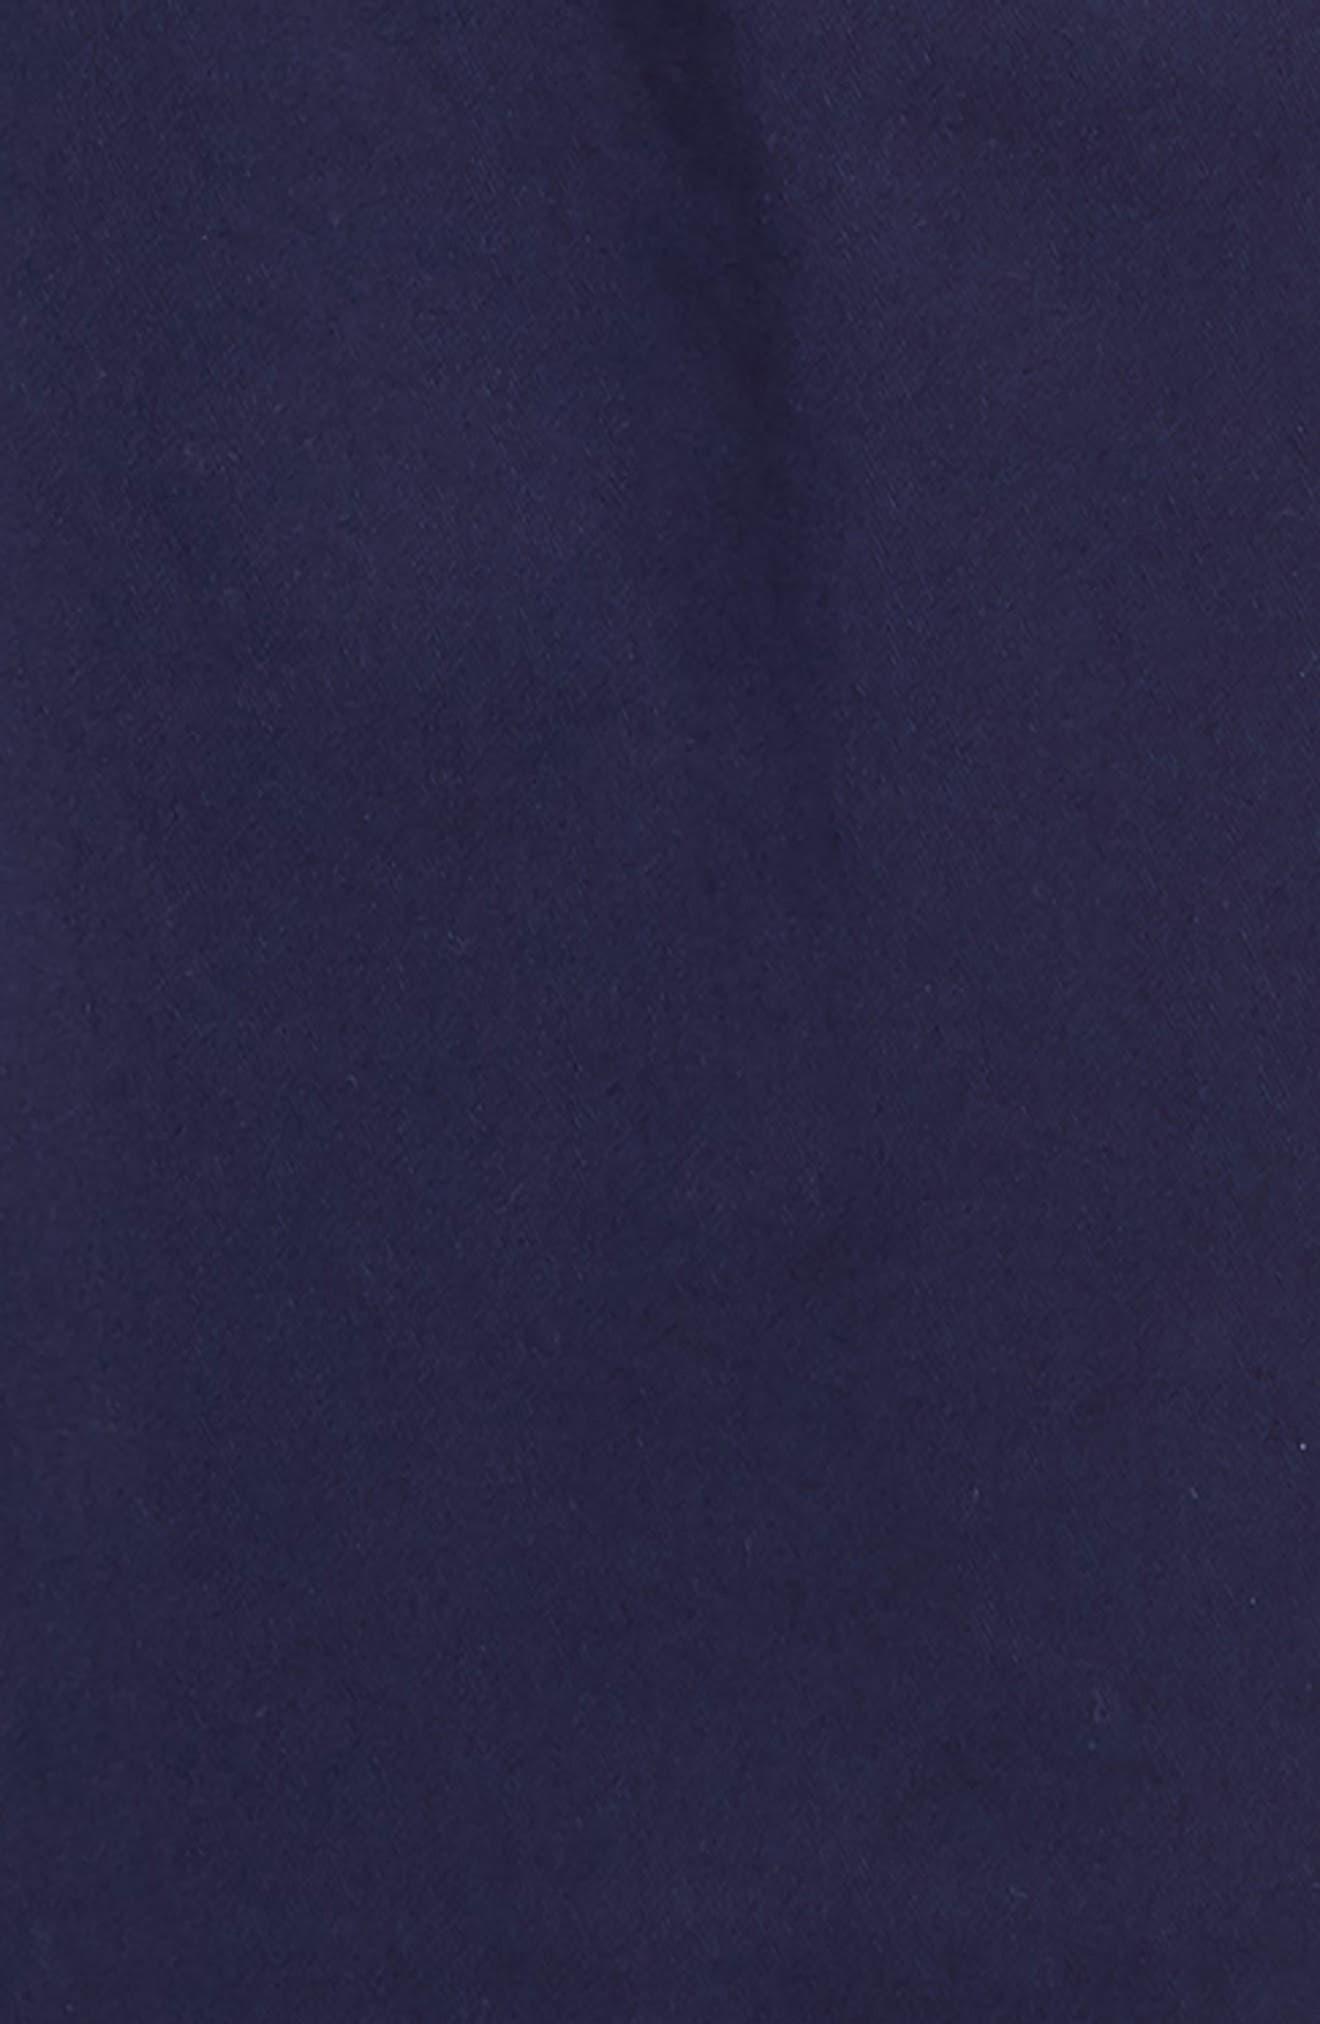 Alternate Image 2  - Bardot Junior Chinos & Suspenders Set (Toddler Boys & Little Boys)